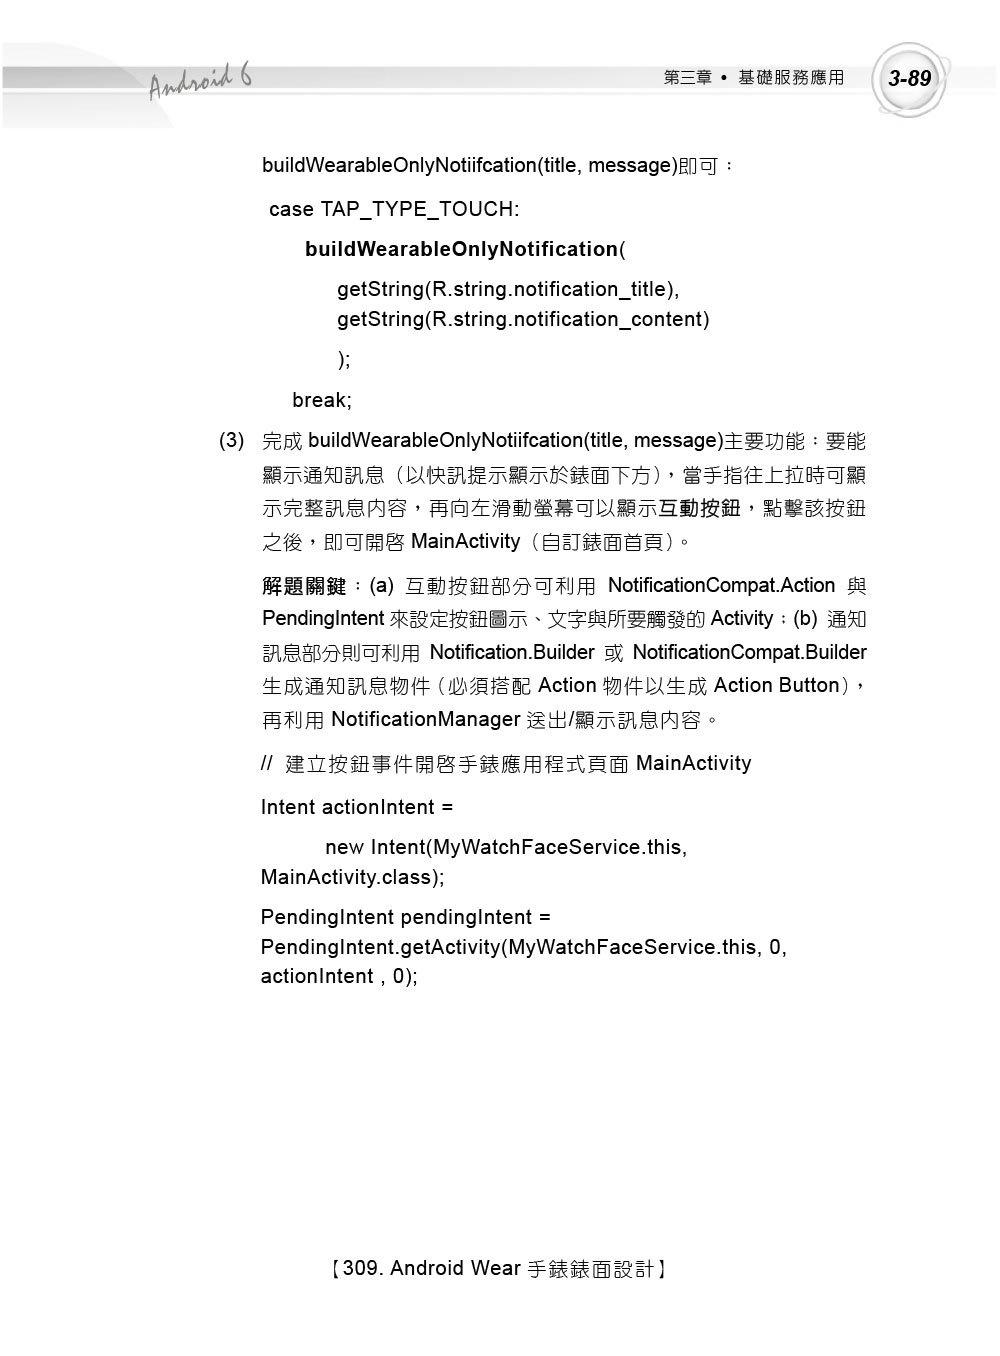 TQC+ 行動裝置應用程式設計認證指南解題秘笈 -- Android 6-preview-18